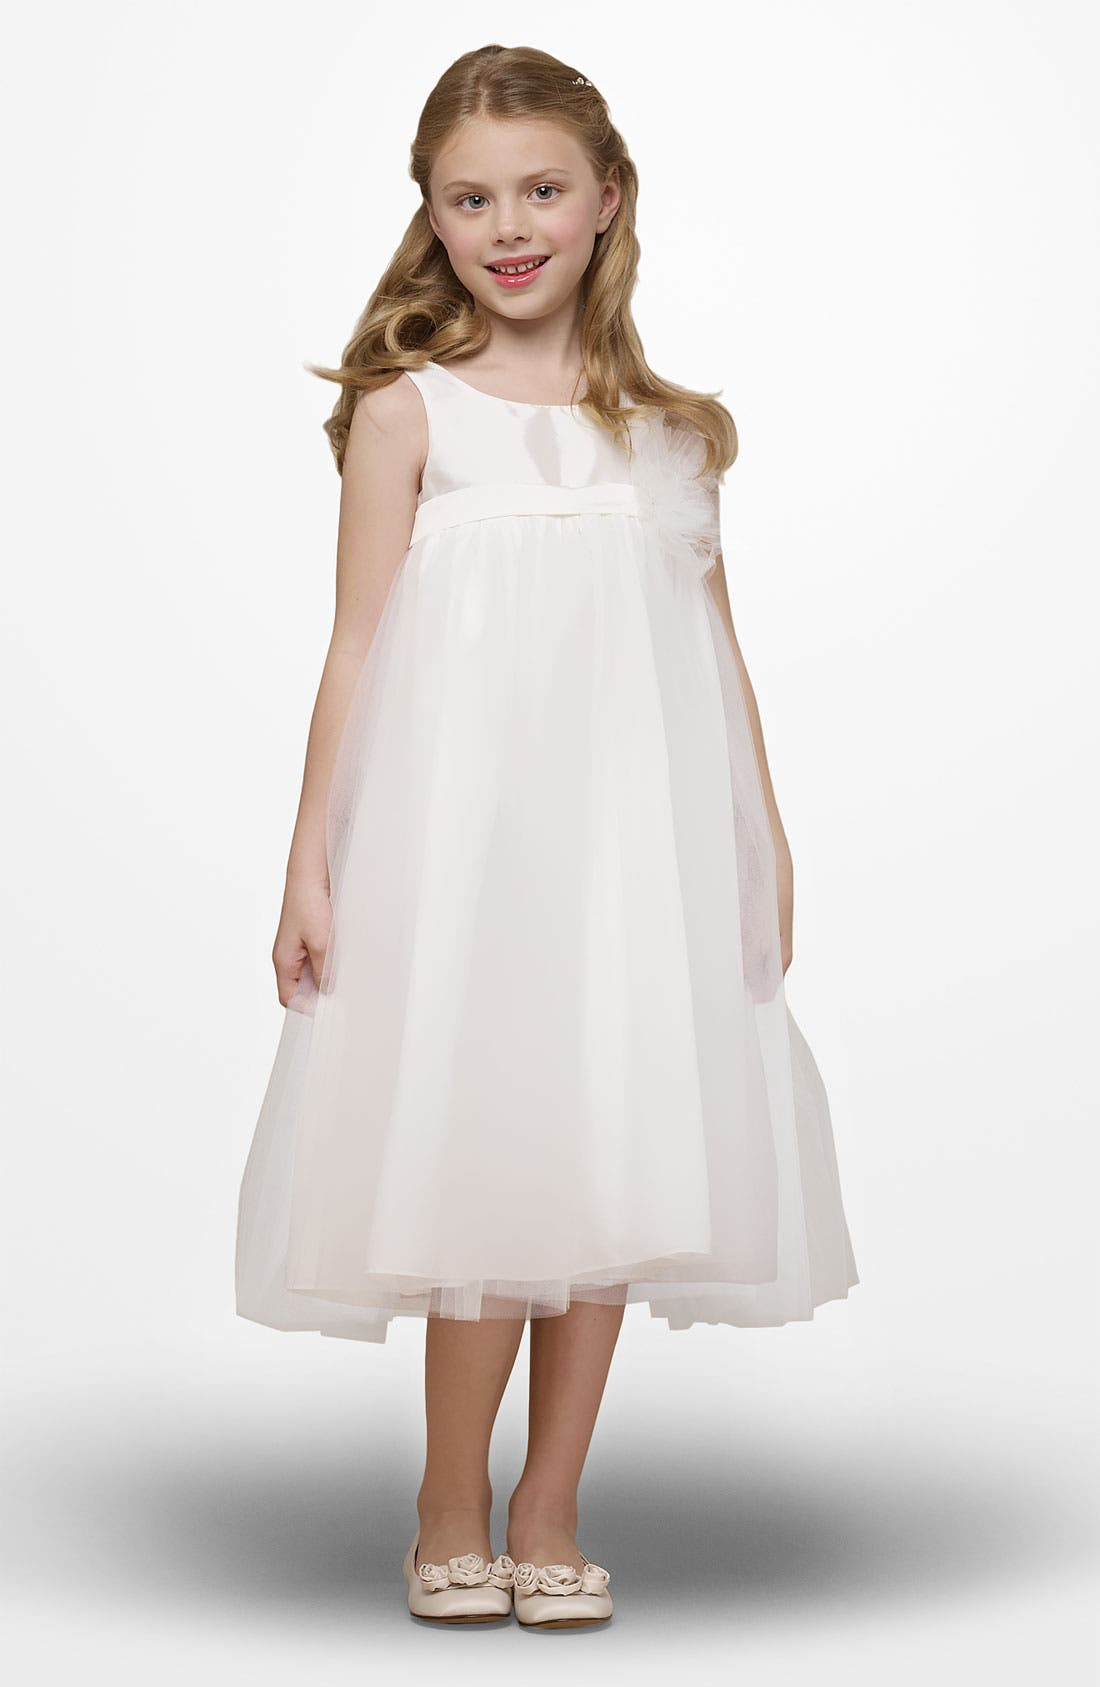 Alternate Image 1 Selected - Us Angels Taffeta Tutu Dress (Little Girls)